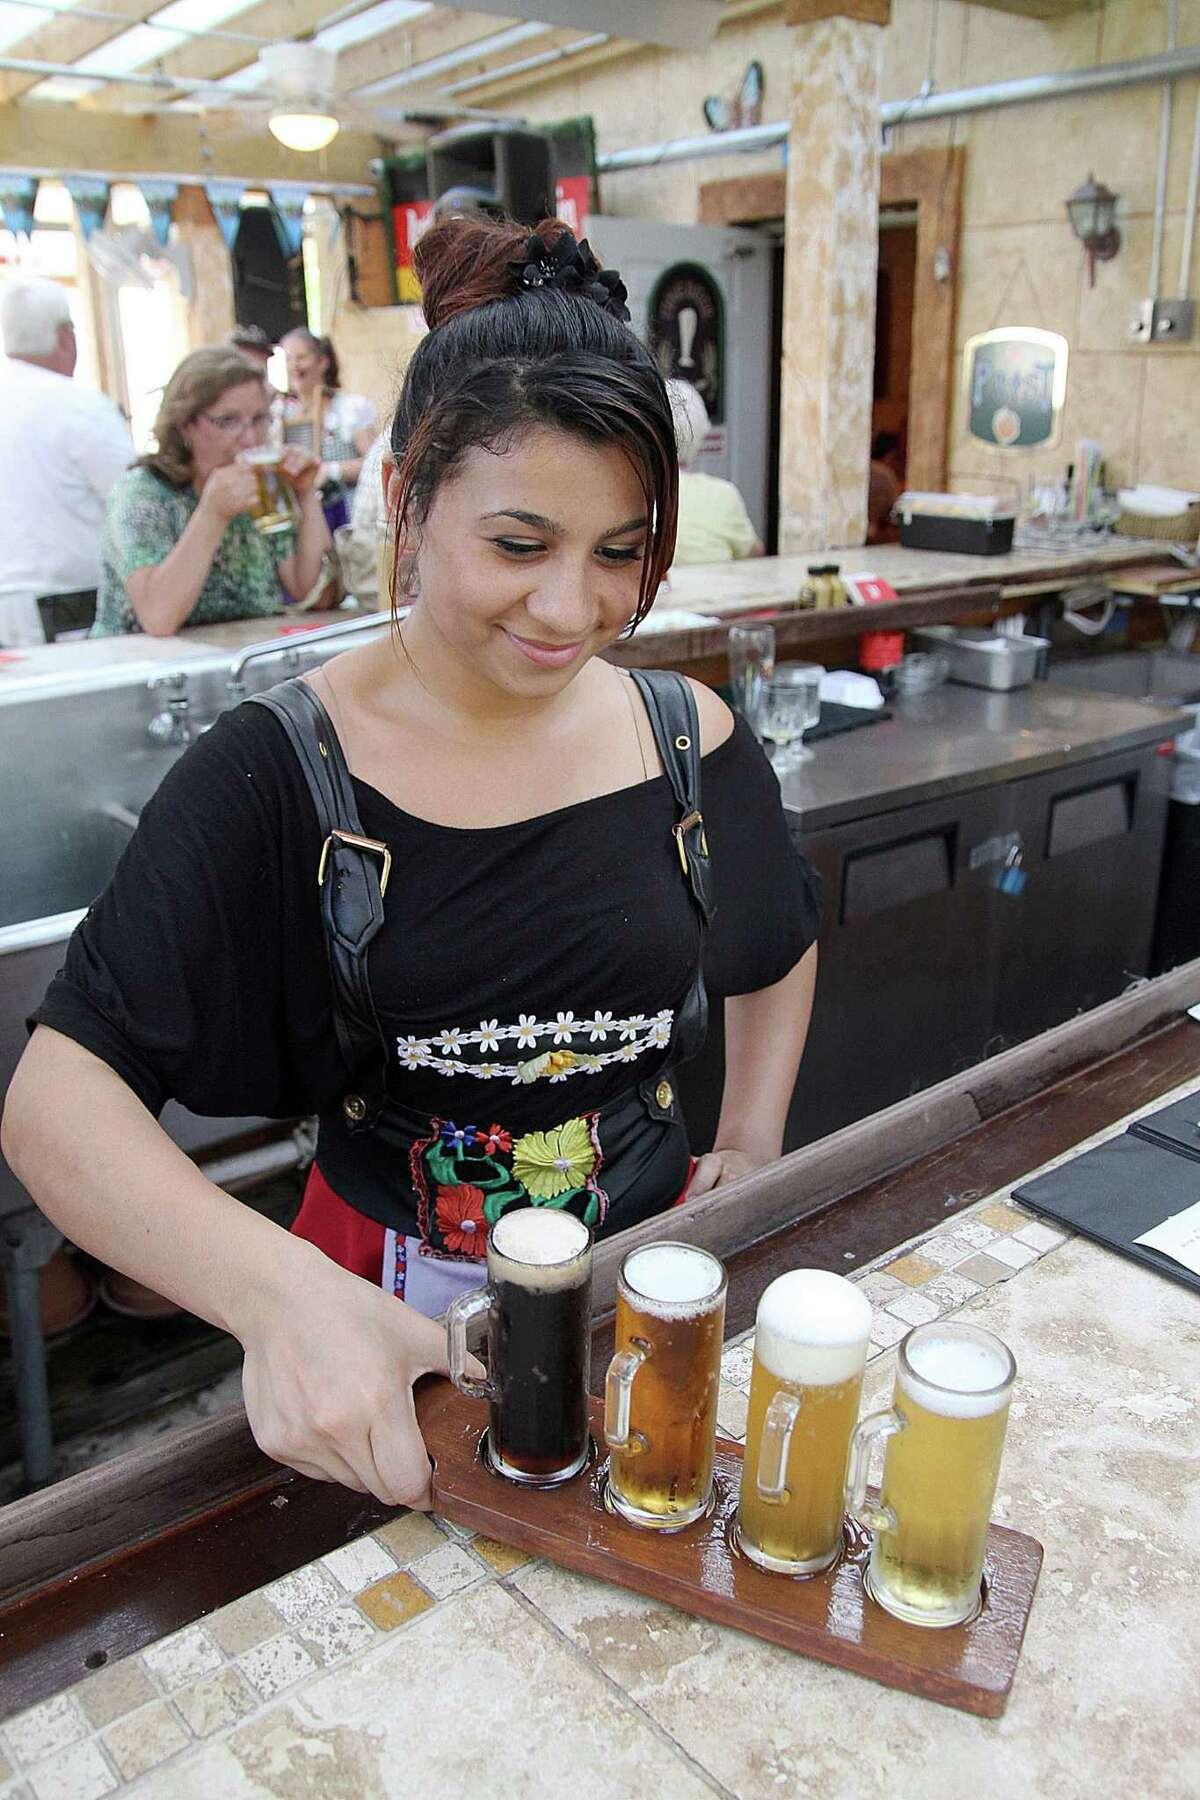 Jeannete Carado showcases a Beer Tour Sampler at King's Biergarten and Restaurant. Jeannete Carado showcases a Beer Tour Sampler at King's Biergarten and Restaurant.